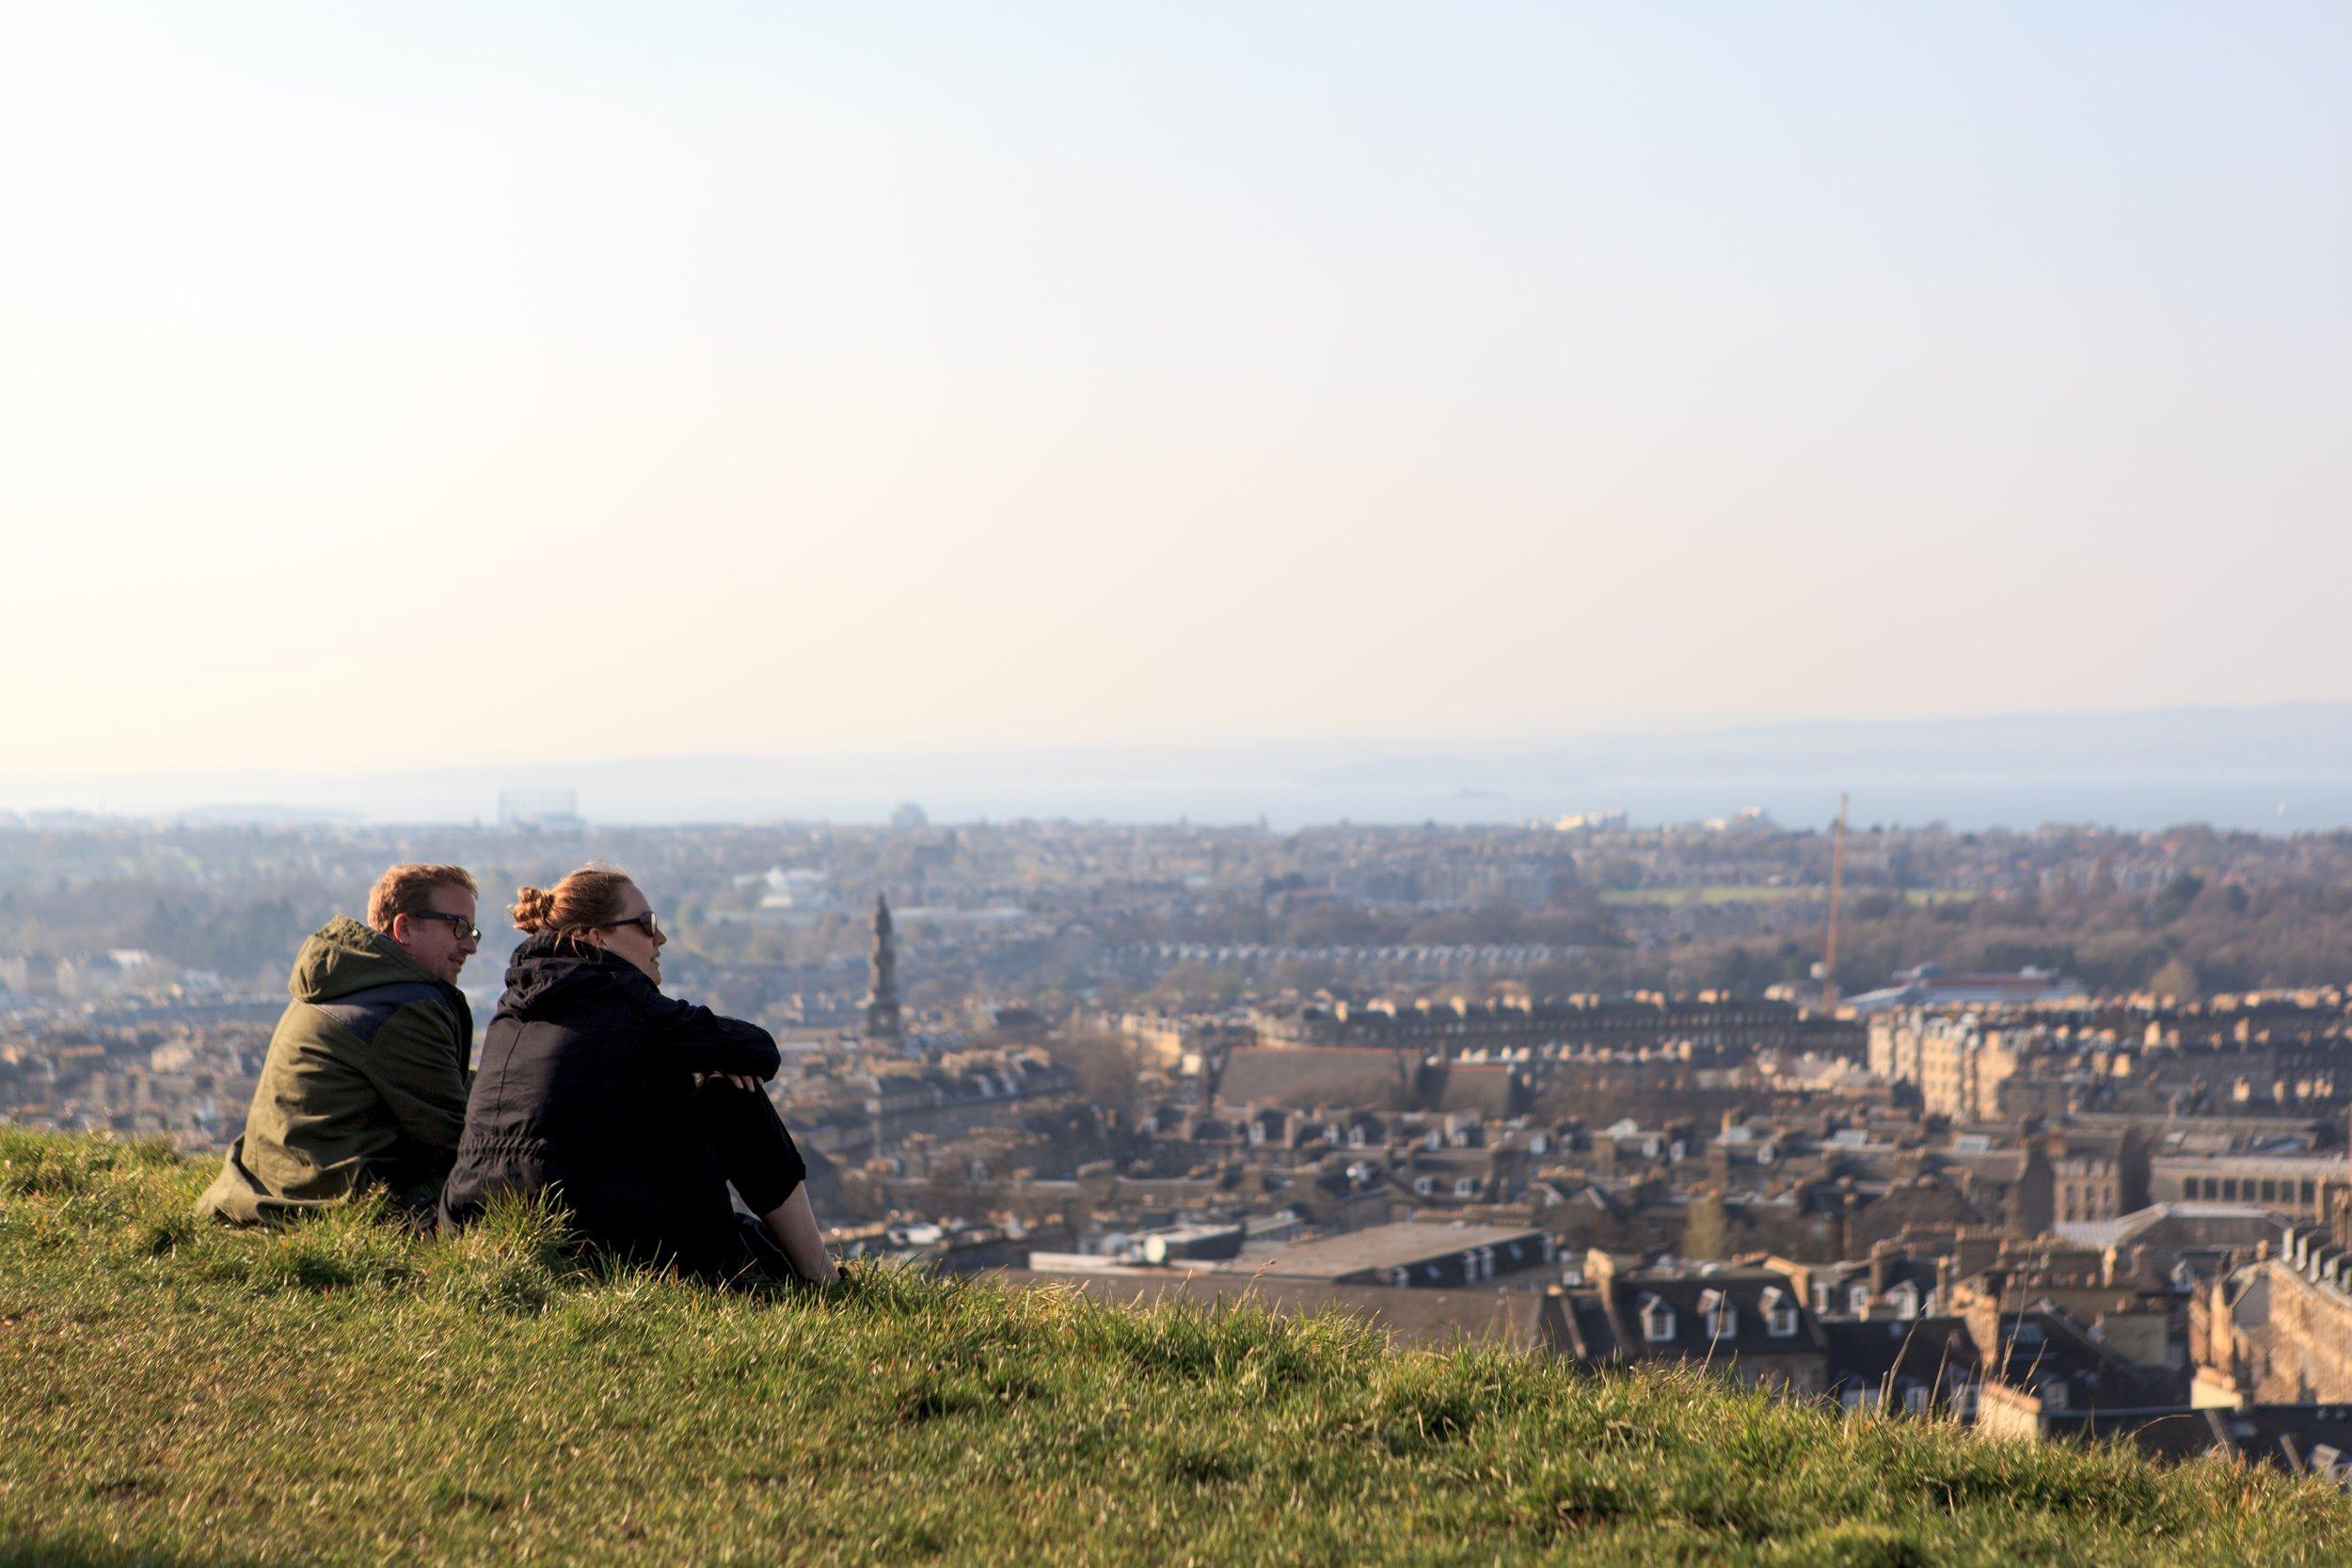 edinburgh-caltonhill-scotland.jpg